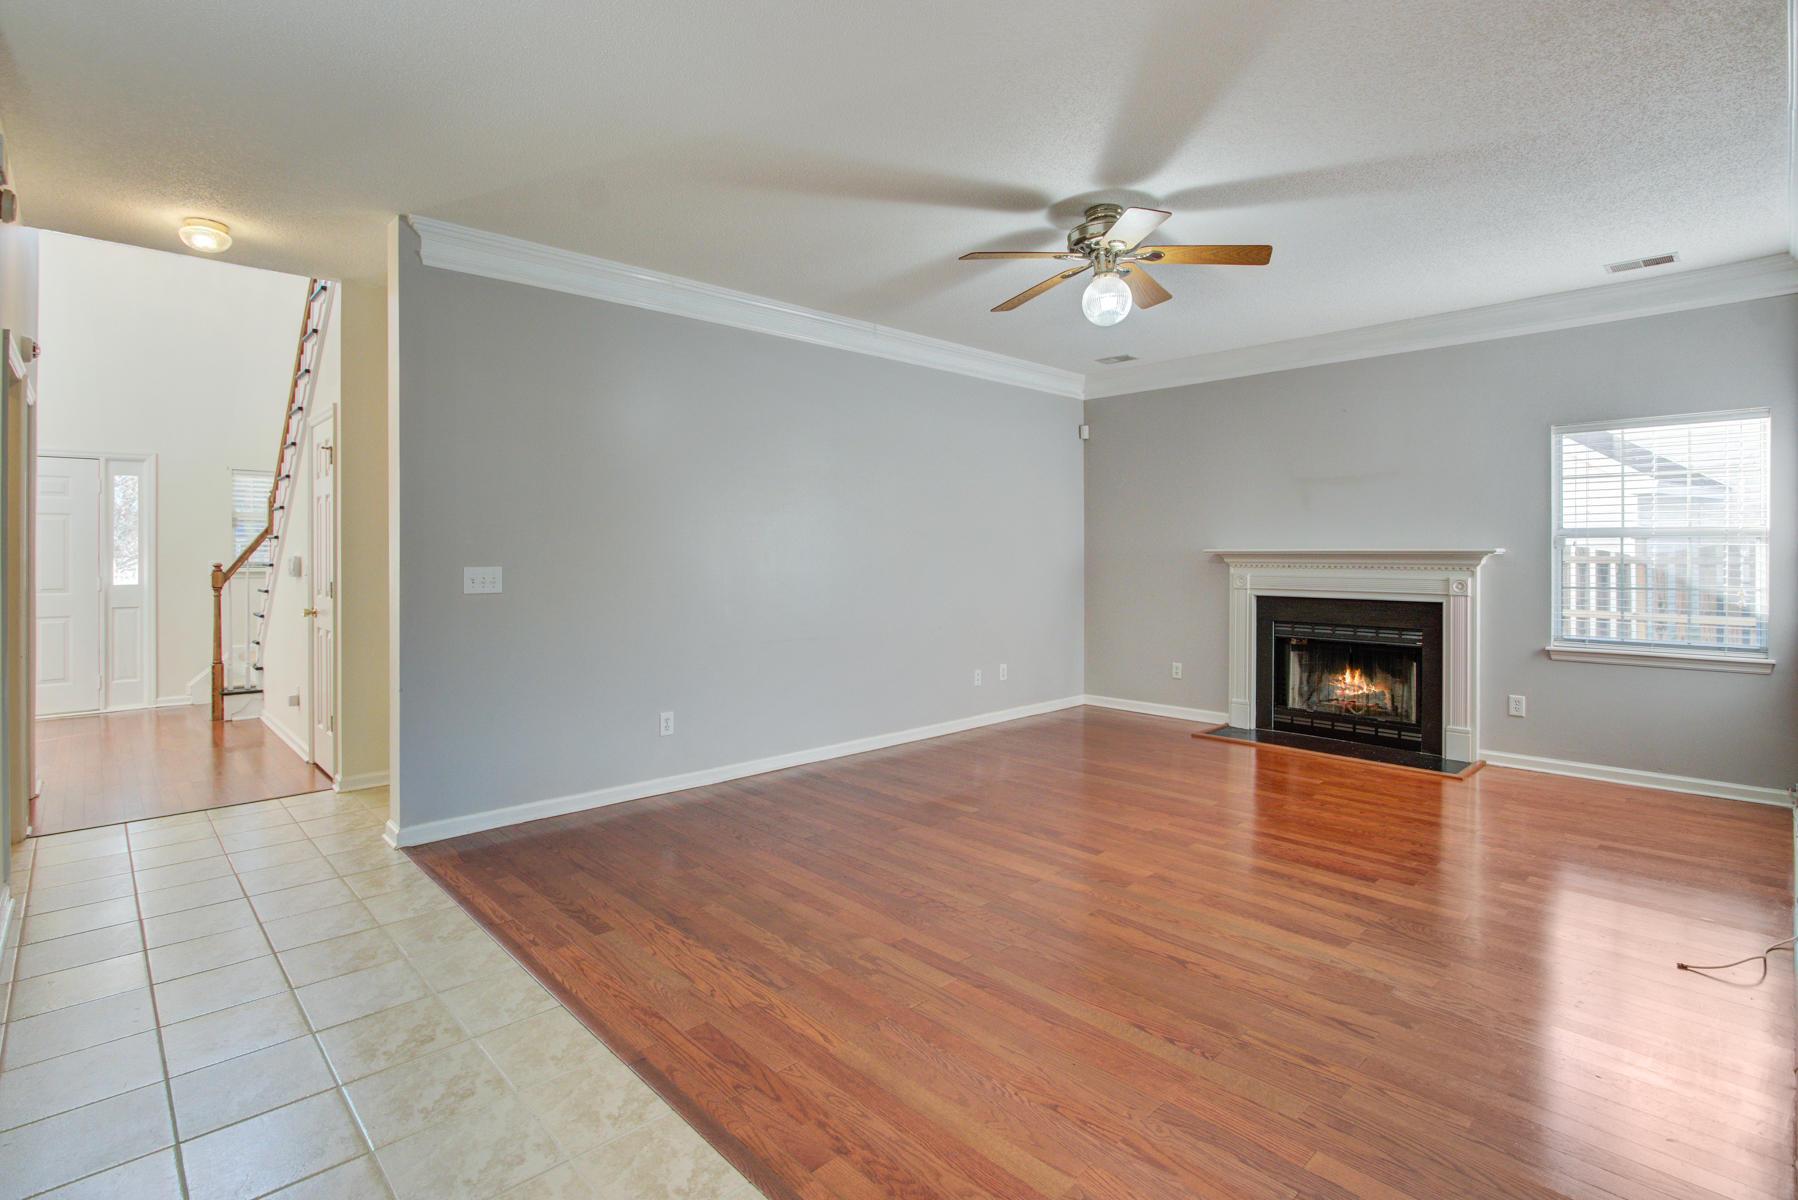 Village Green Homes For Sale - 3323 Hearthside, Charleston, SC - 32